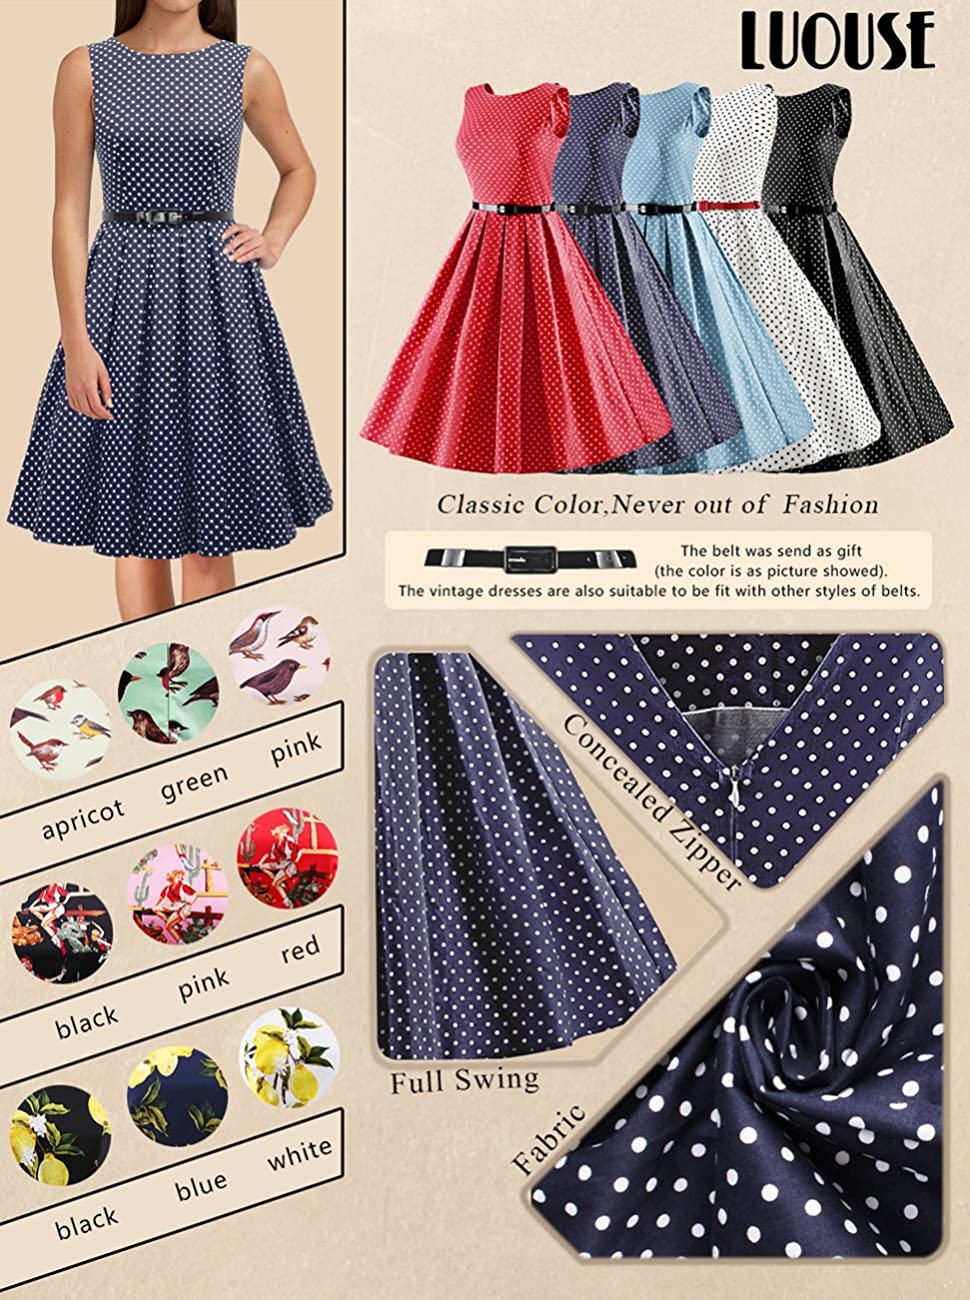 LUOUSE  Womens 1950s Vintage Rockabilly Swing Dress